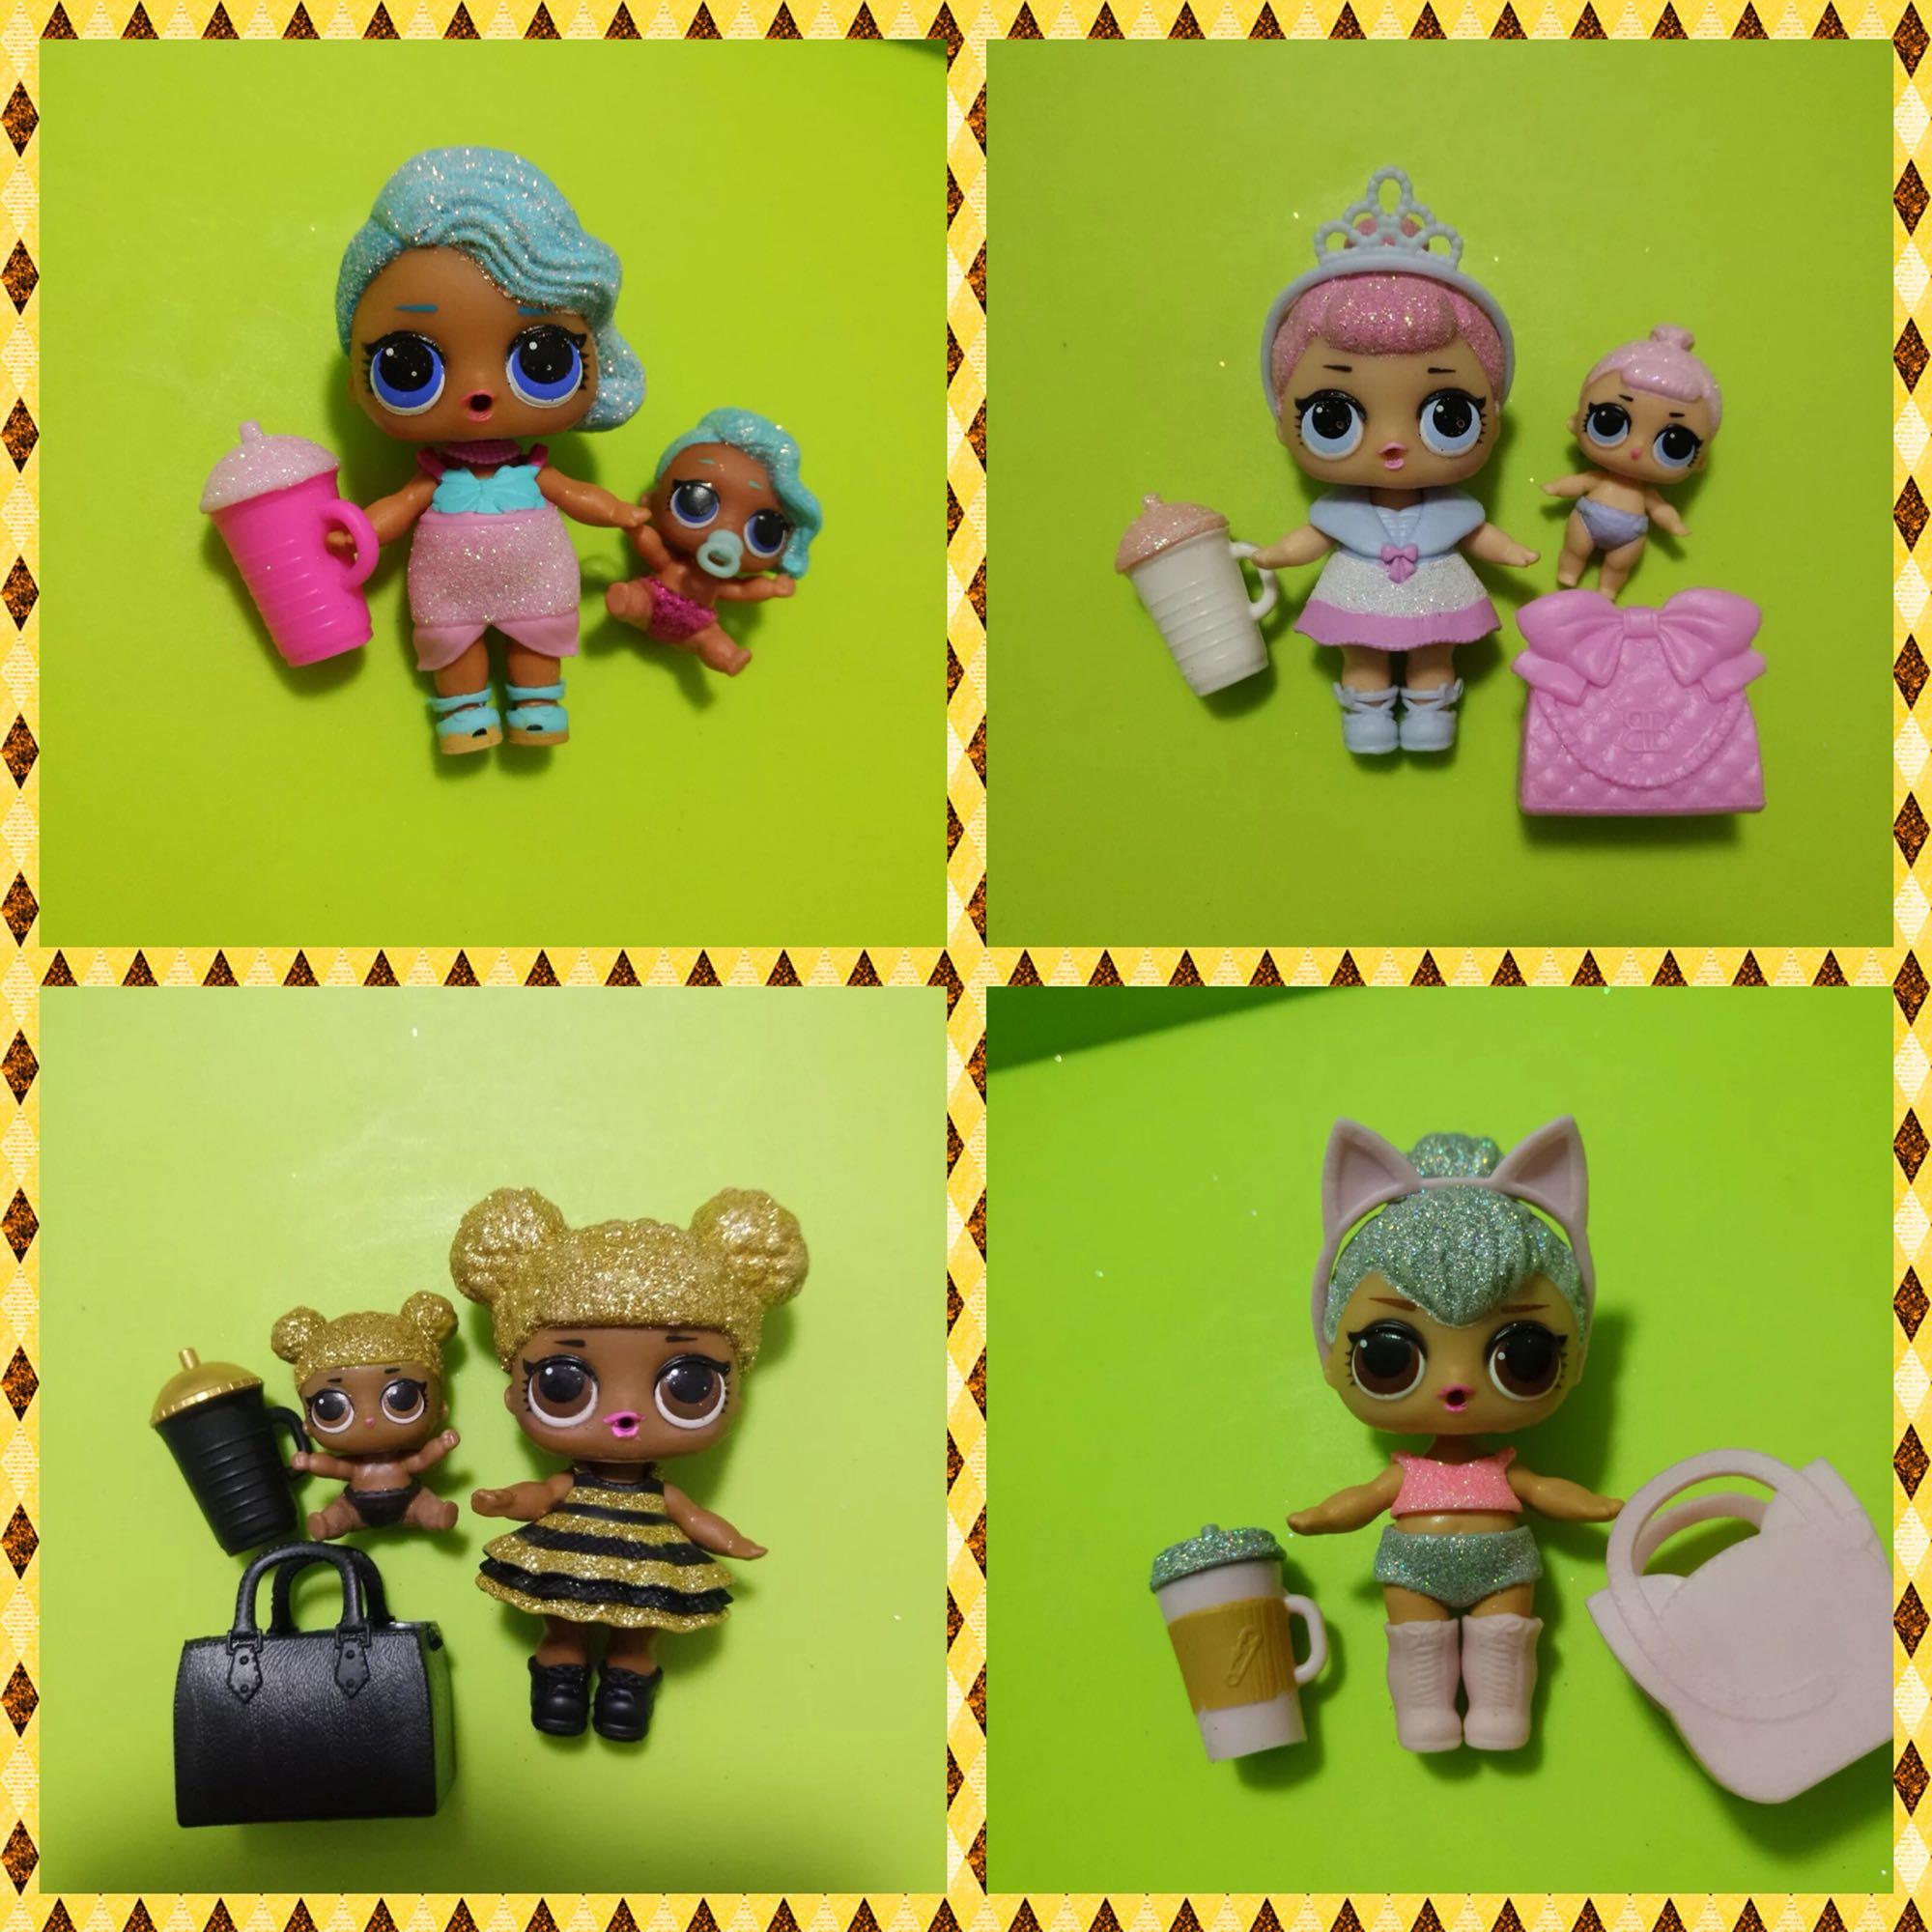 Lol. Surprise! O.M.G. Original Rare Style Children's Toys Dolls Action Figure Model Girl Christmas Gift